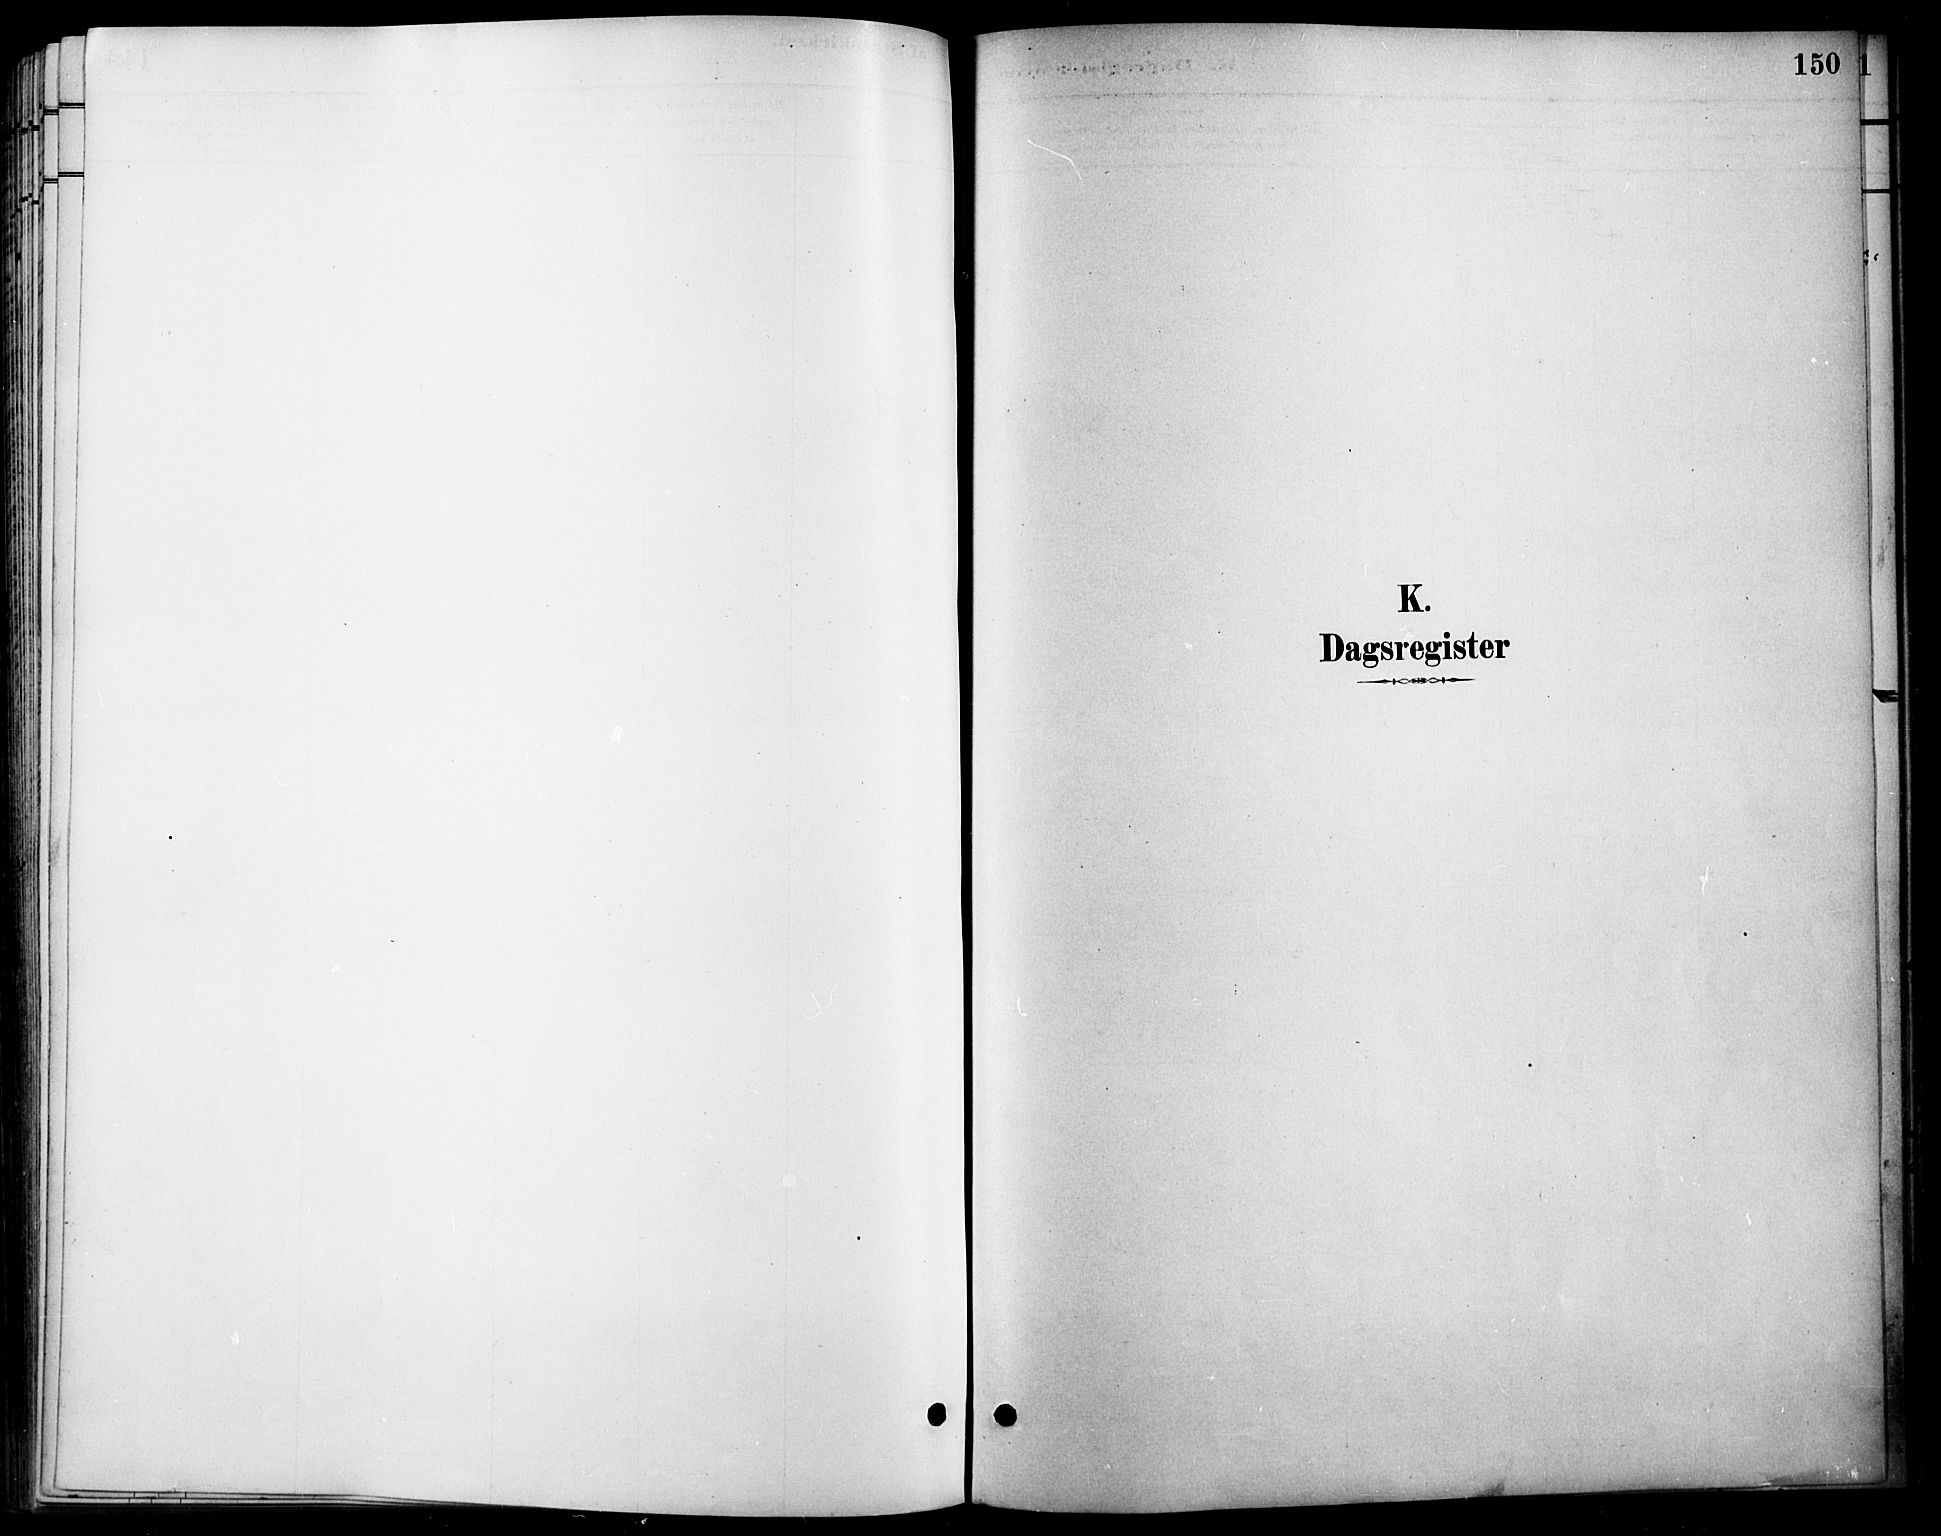 SAO, Nannestad prestekontor Kirkebøker, F/Fa/L0014: Ministerialbok nr. I 14, 1881-1890, s. 150